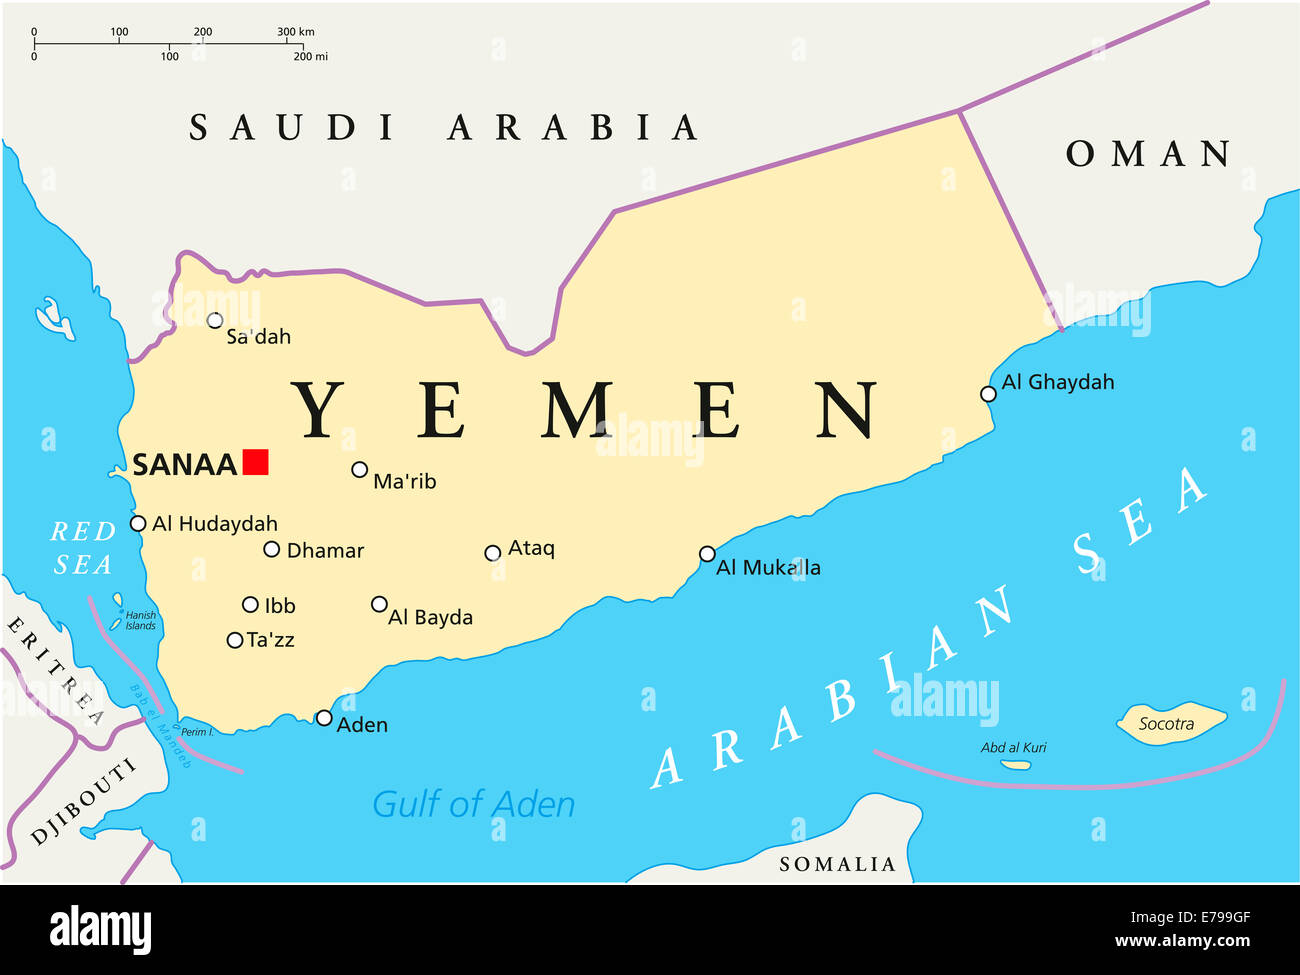 Jemen Kapital Karte